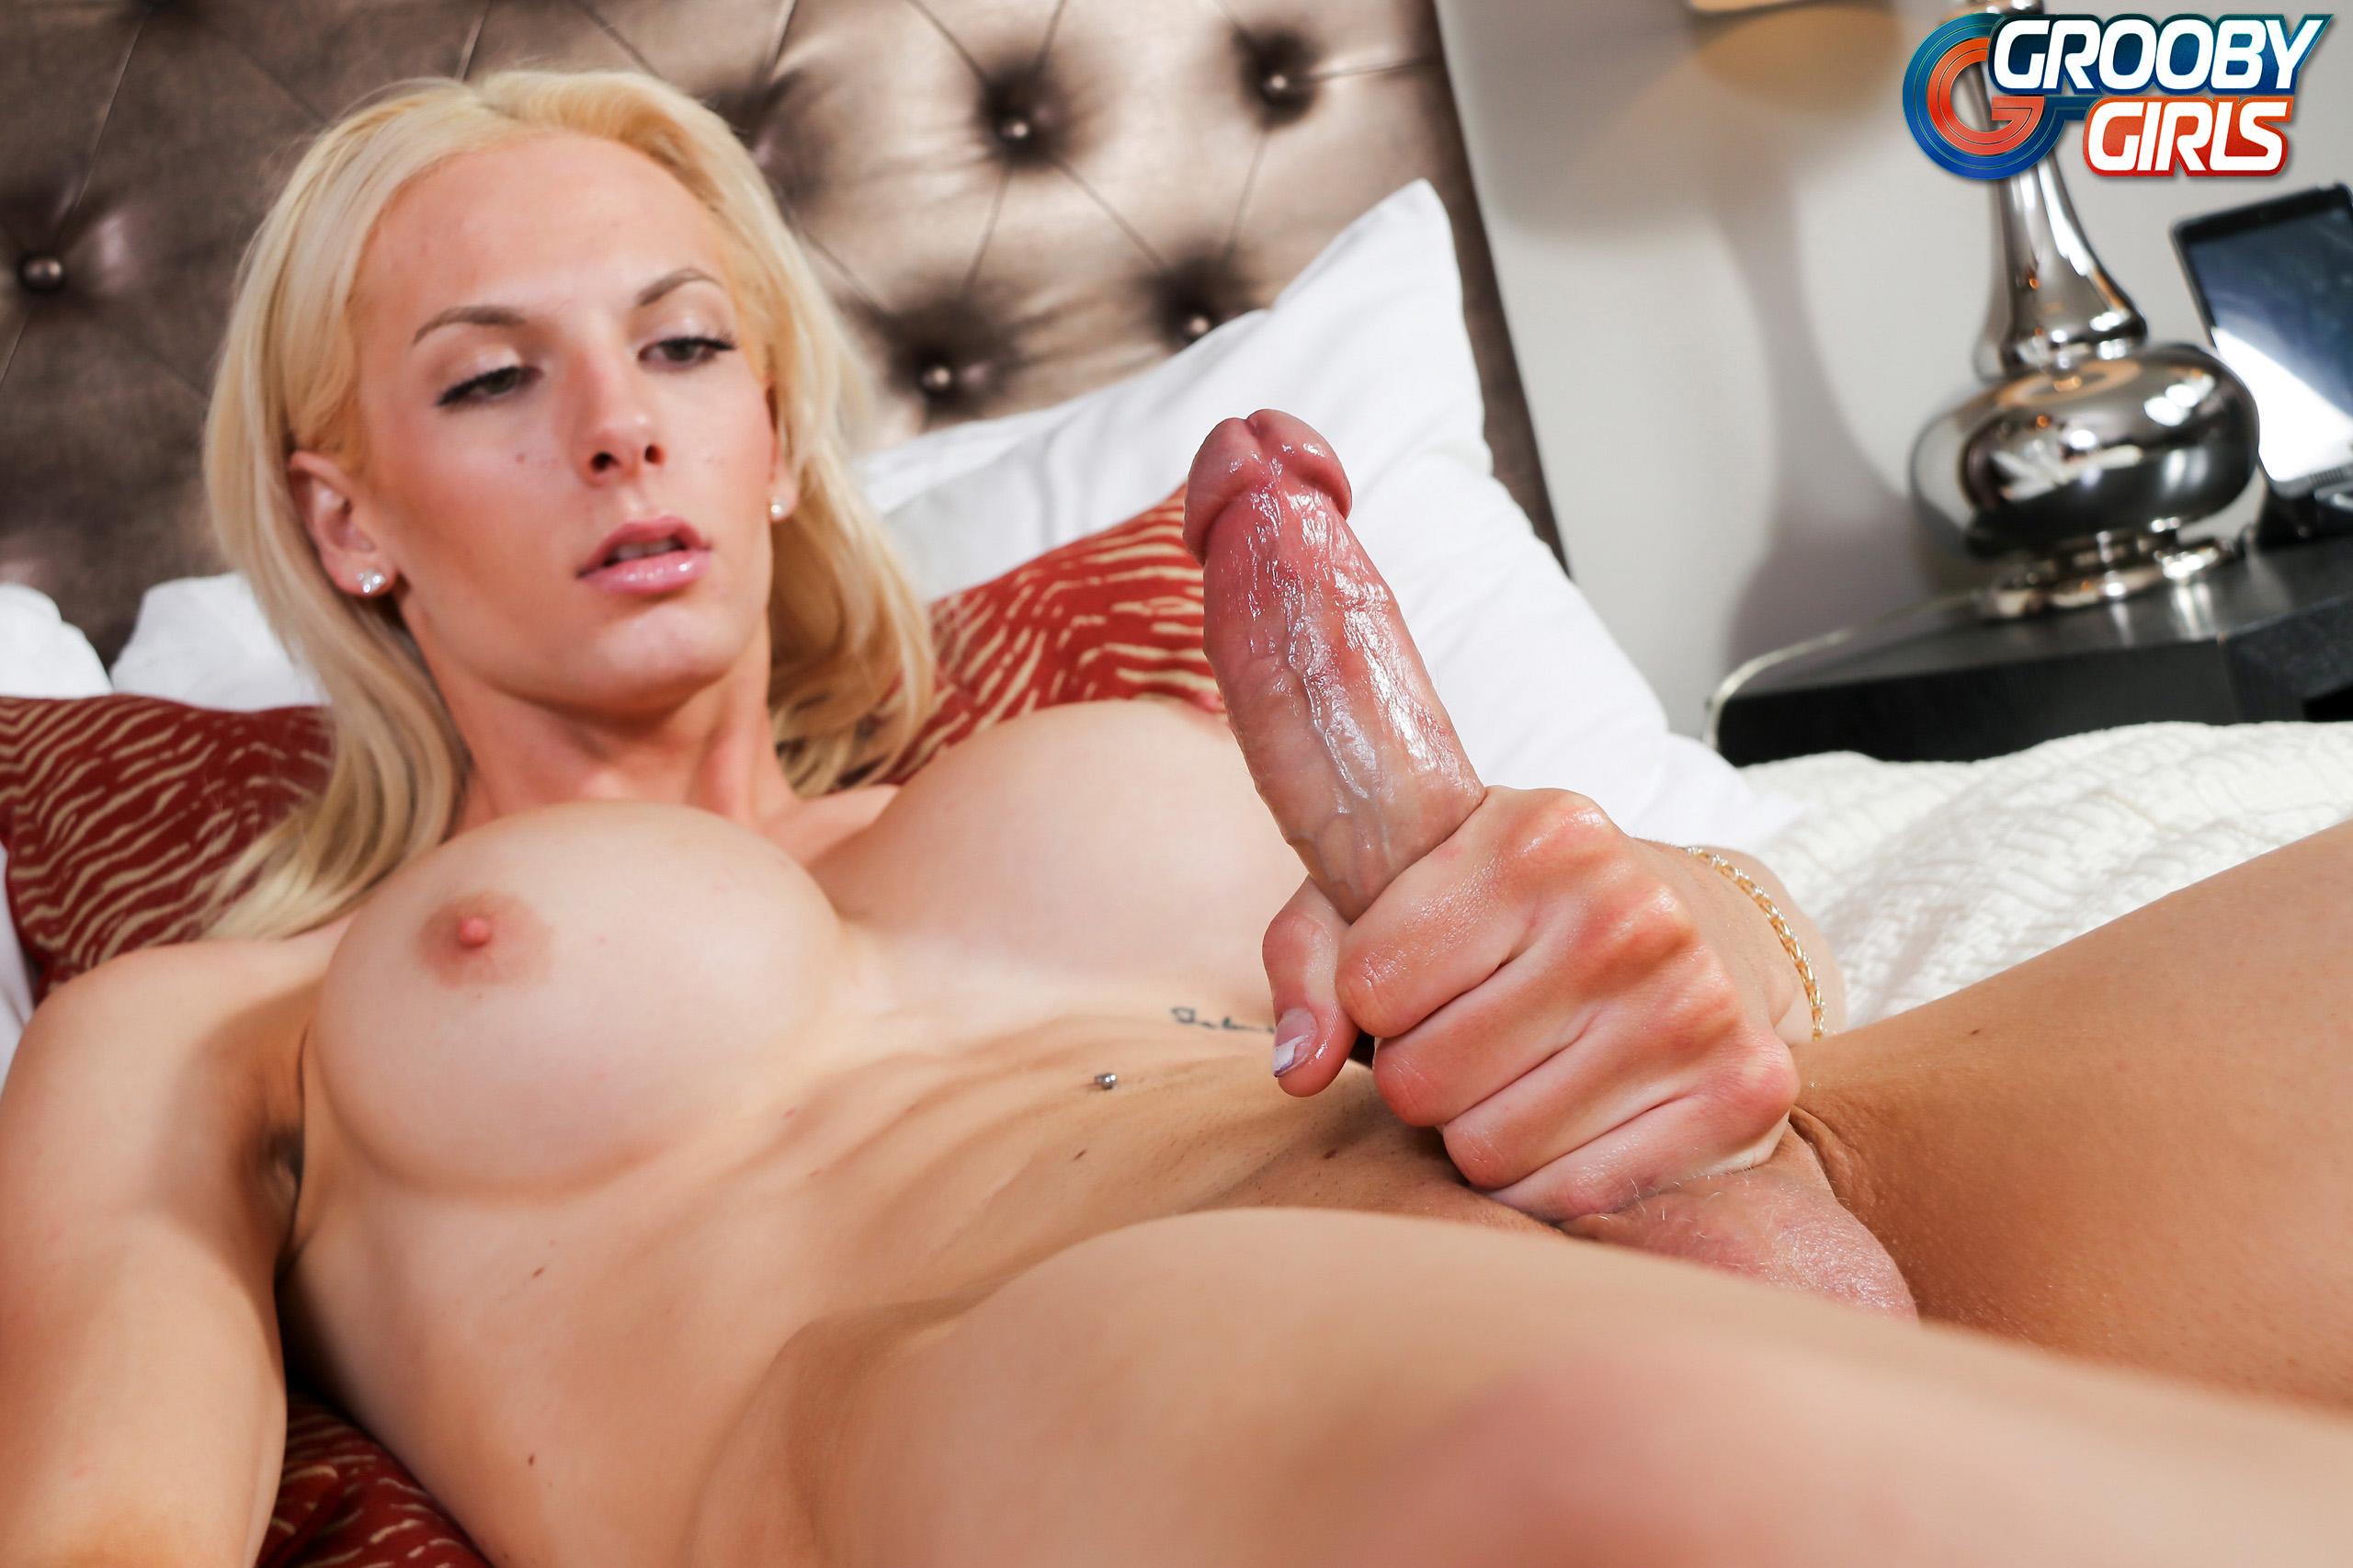 Sauberan recommends Hot women in stocking